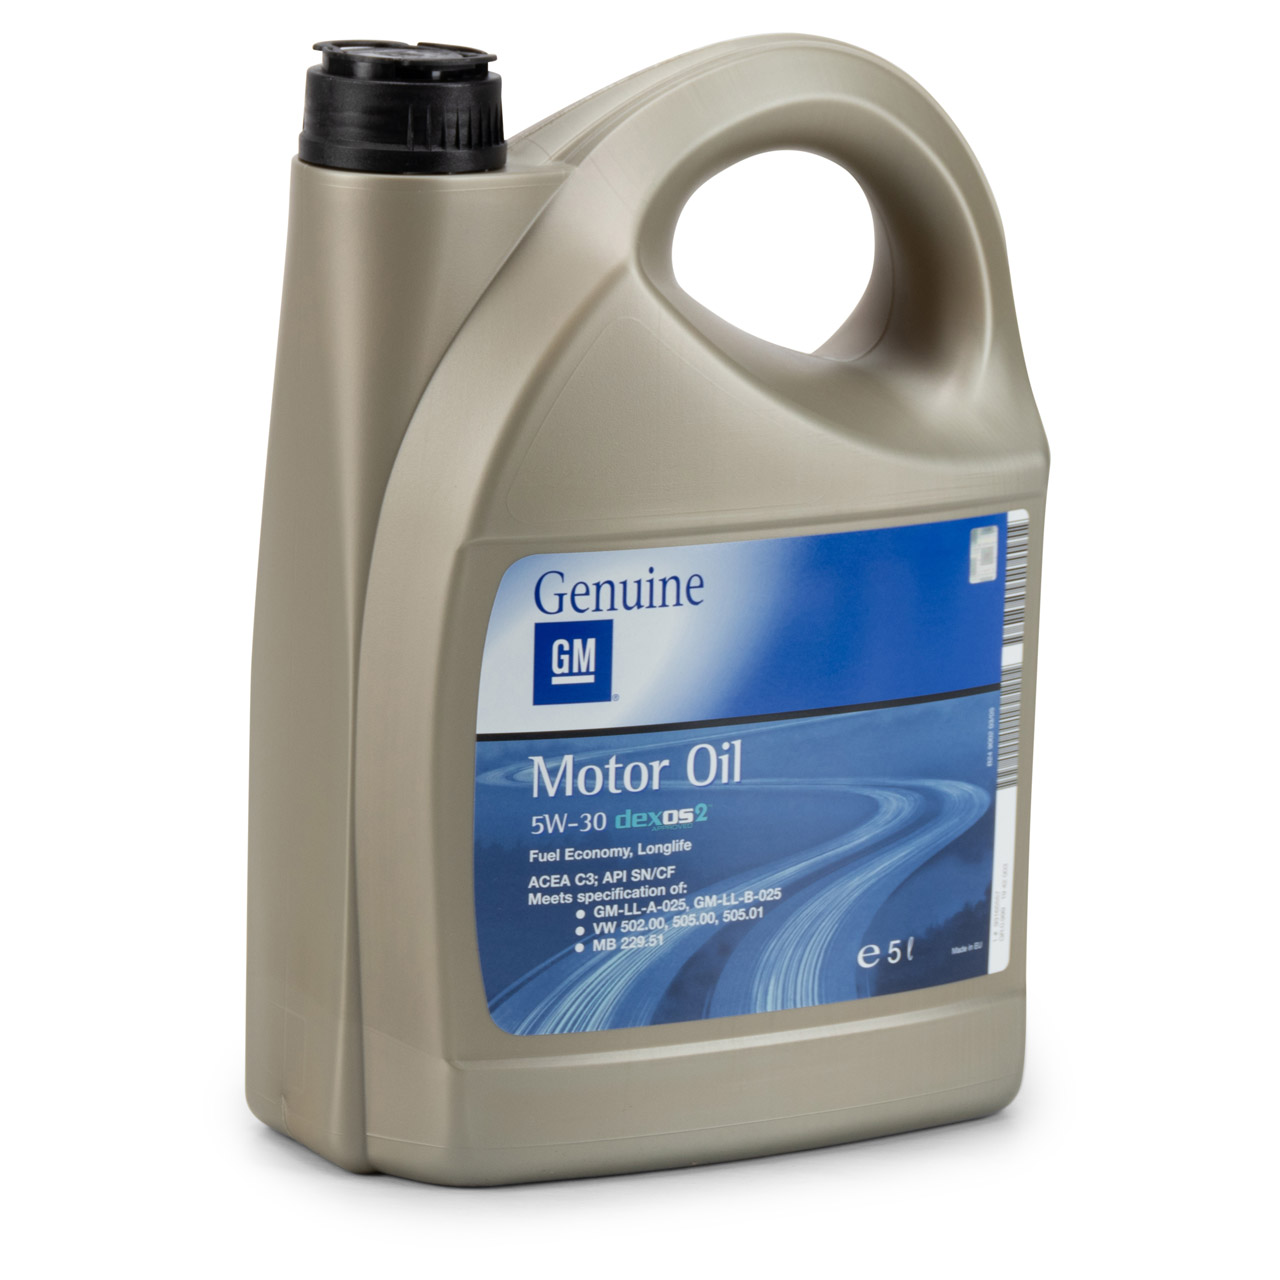 ORIGINAL GM Opel Motoröl Öl 5W-30 5W30 dexos2 LONGLIFE 5 Liter 1942003 93165557